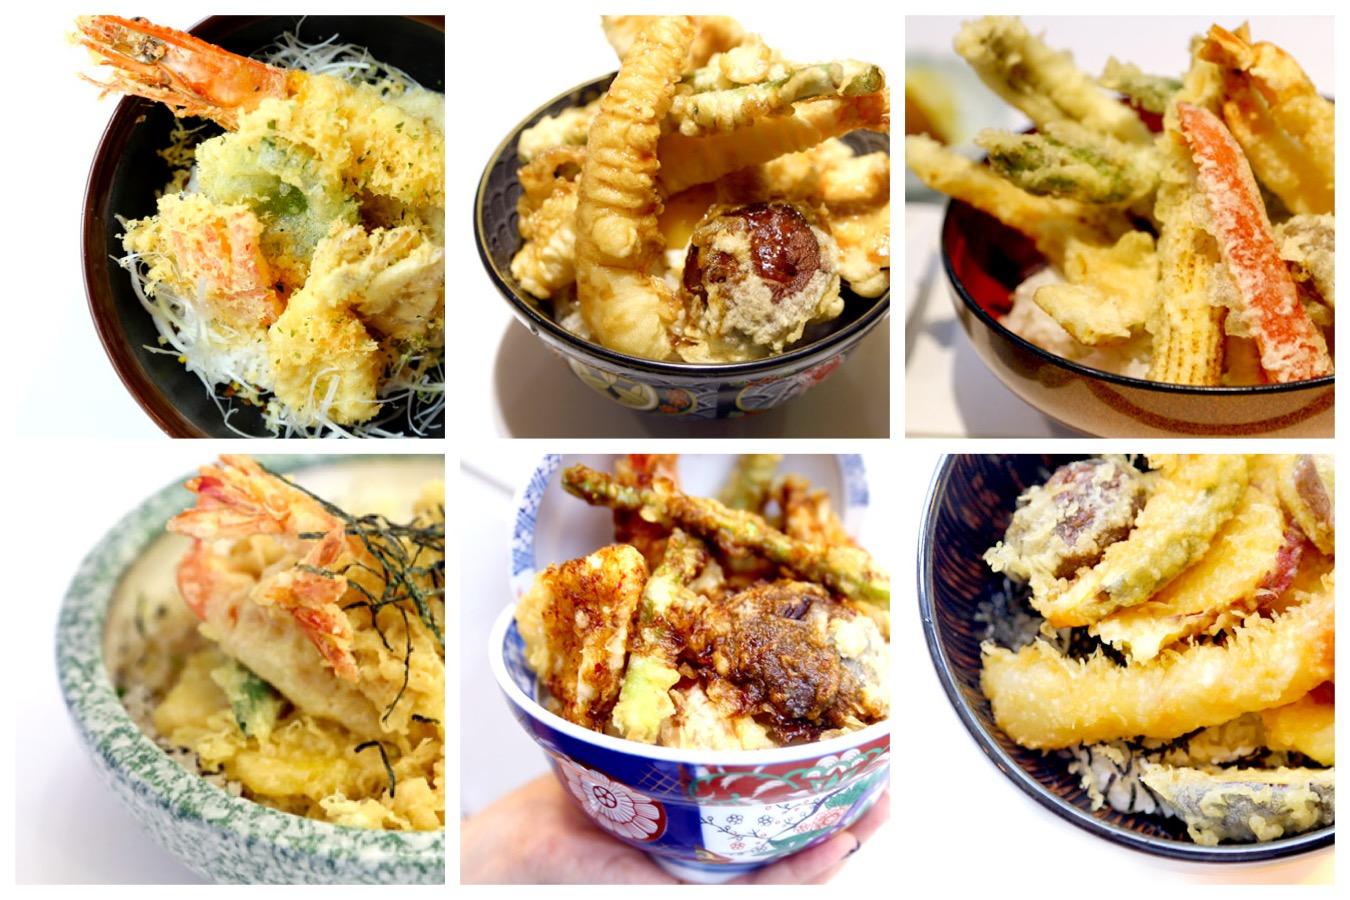 7 Tasty Bowls Of Tendon In Singapore - Time For Japanese Tempura Donburi